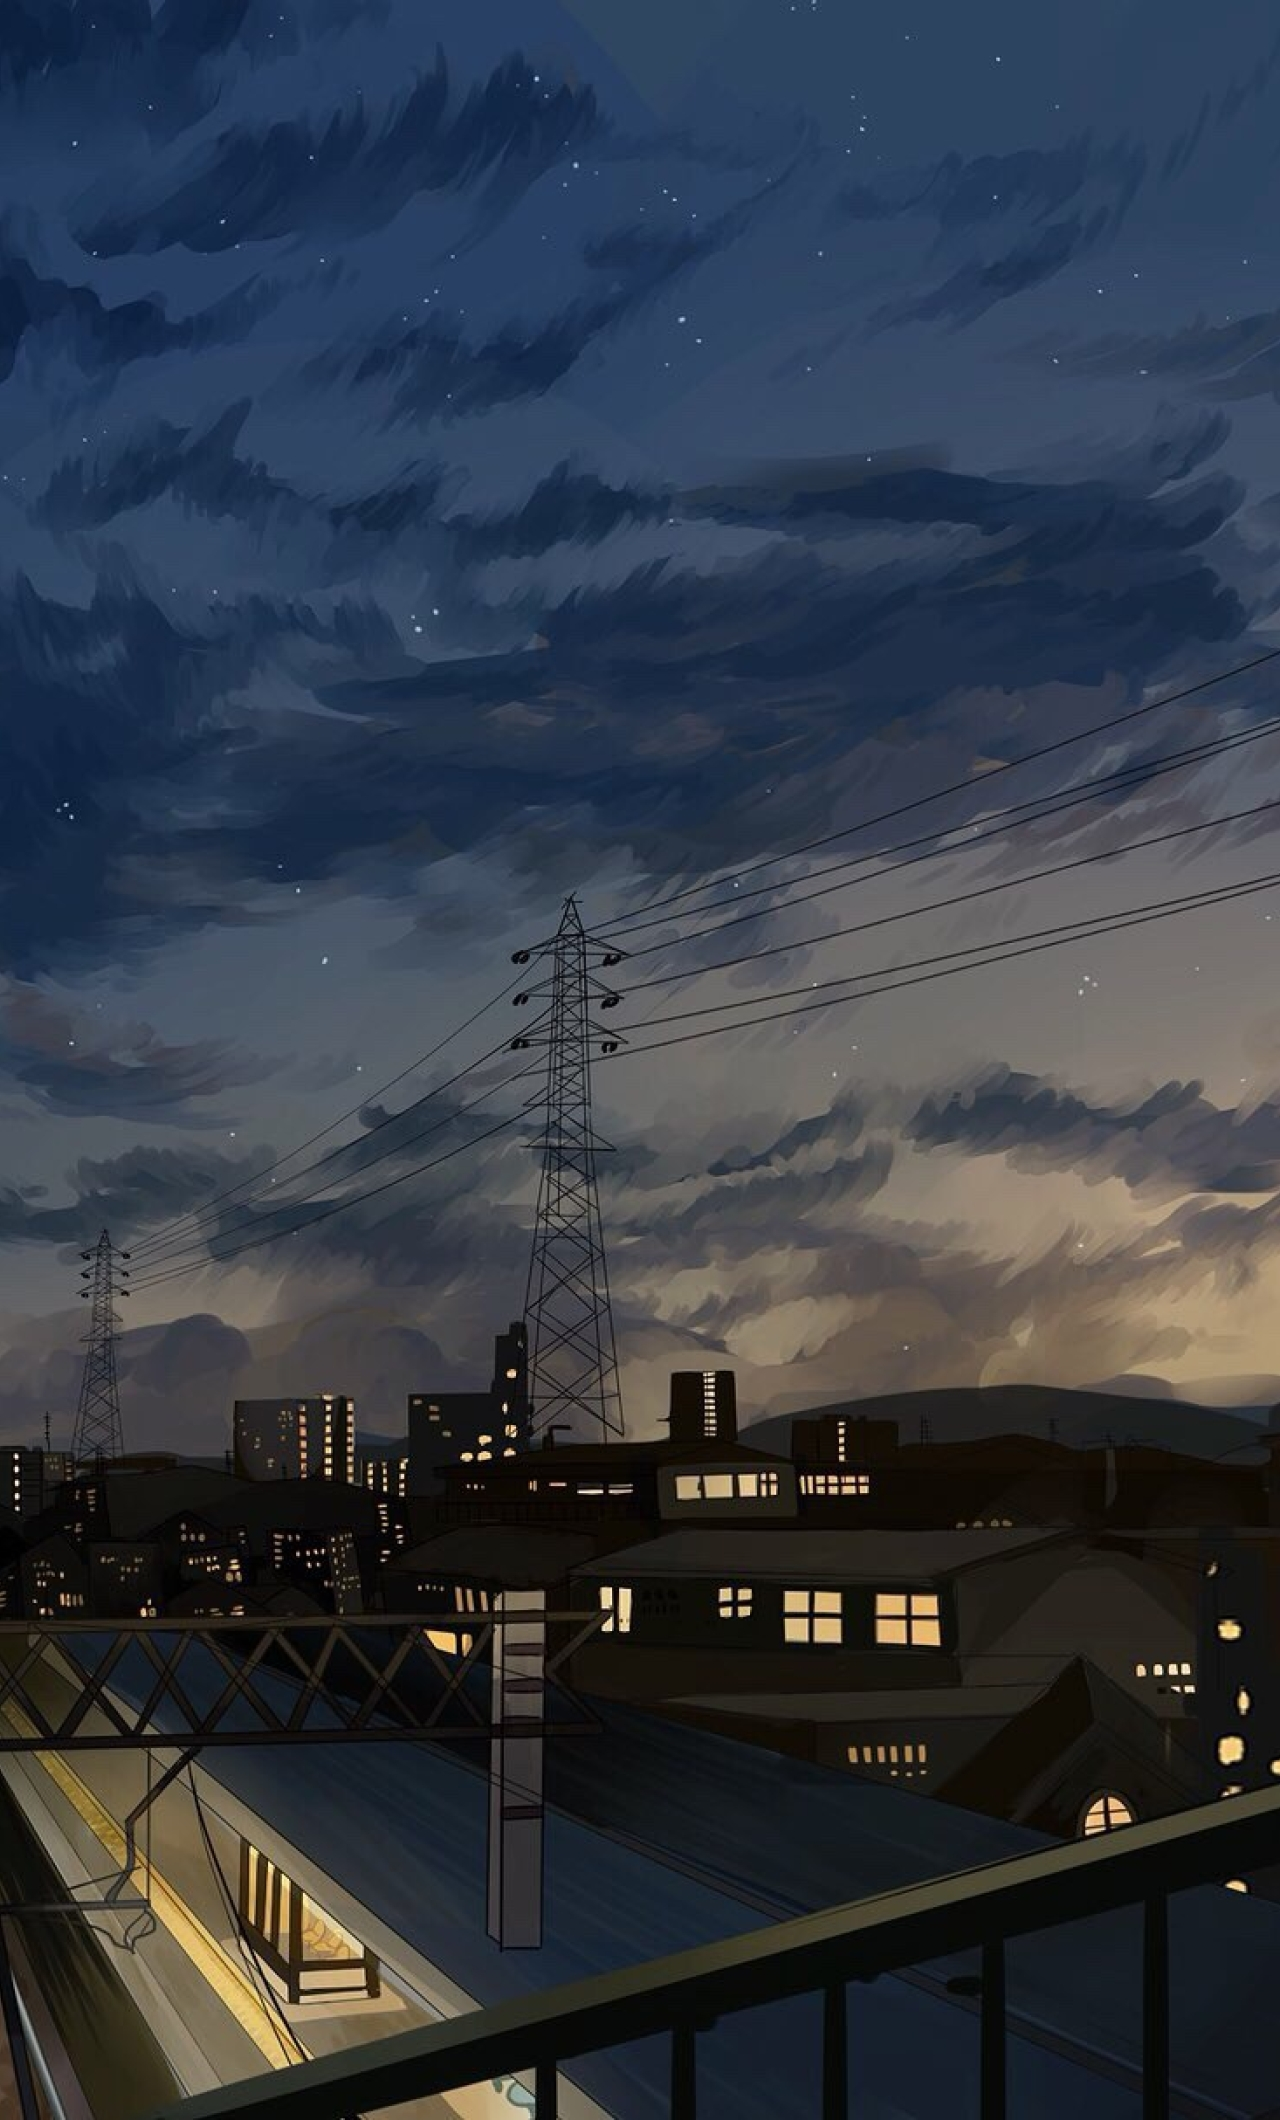 1280x2120 Anime Girl In School Uniform Watching City Sky